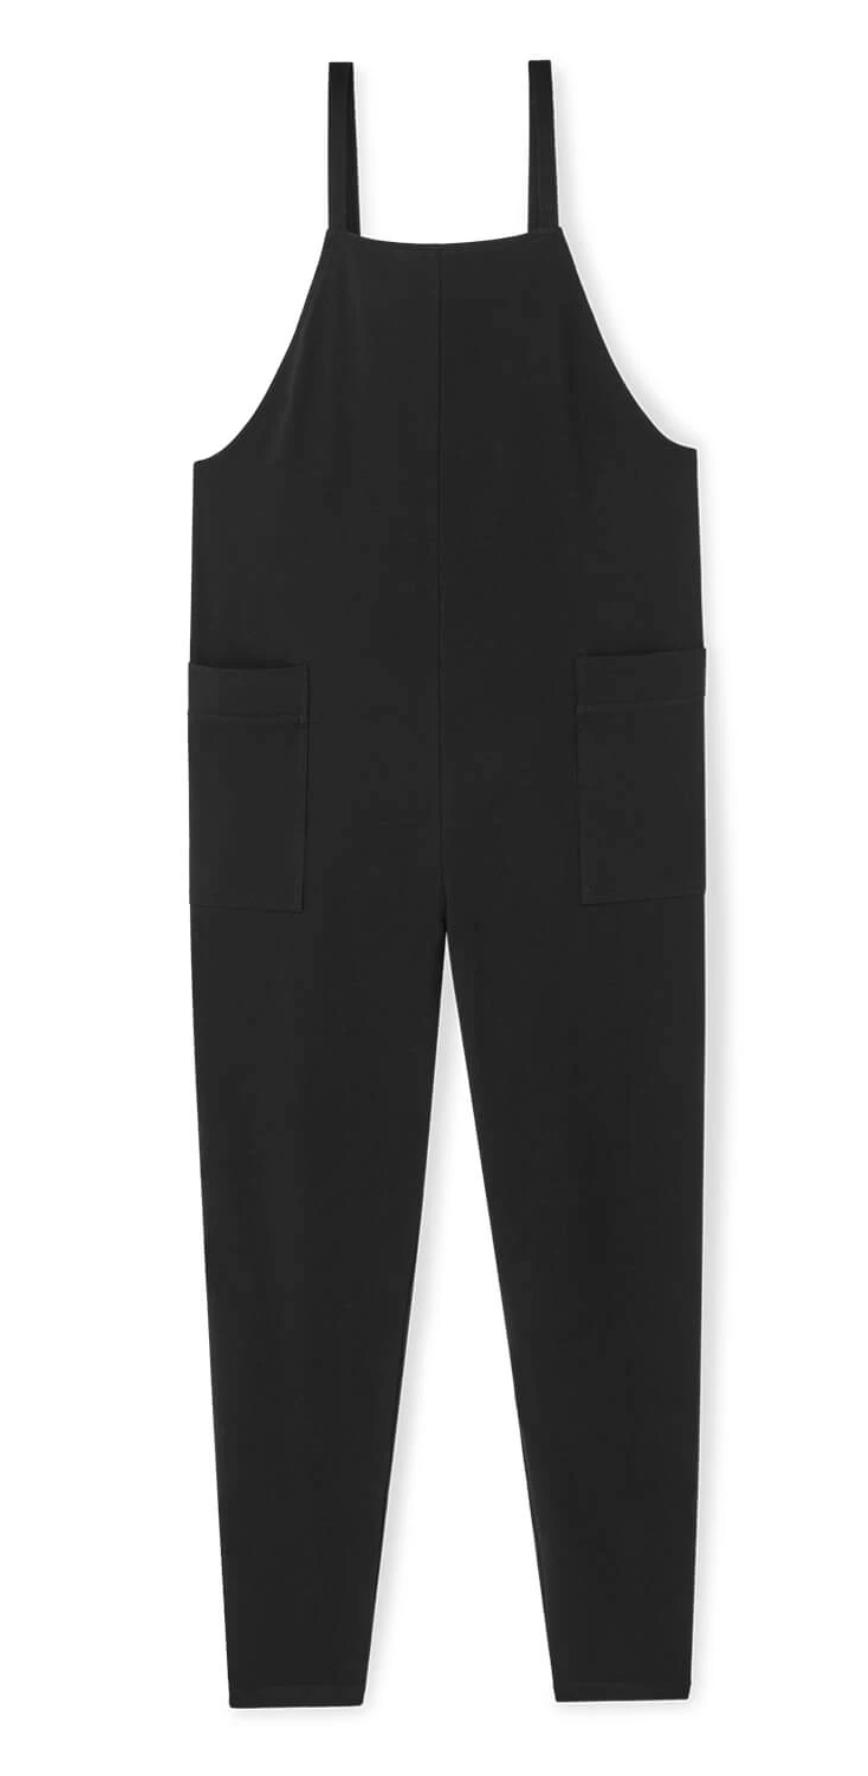 storq overalls